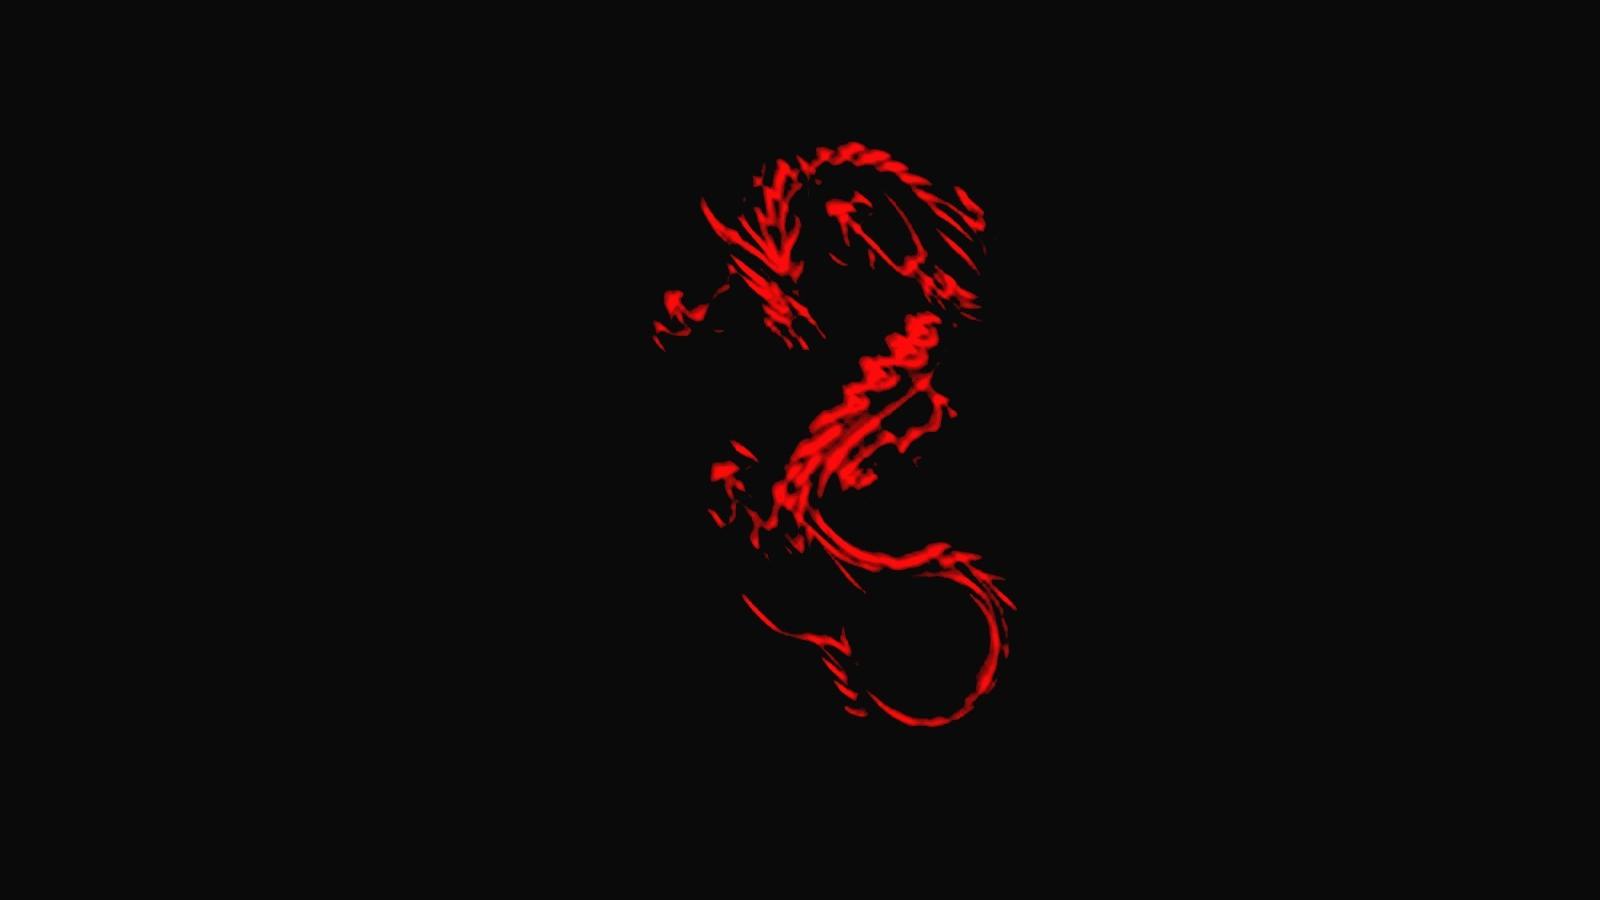 Free Download Cool Red Dragon Wallpaper Dark Red Wallpaper